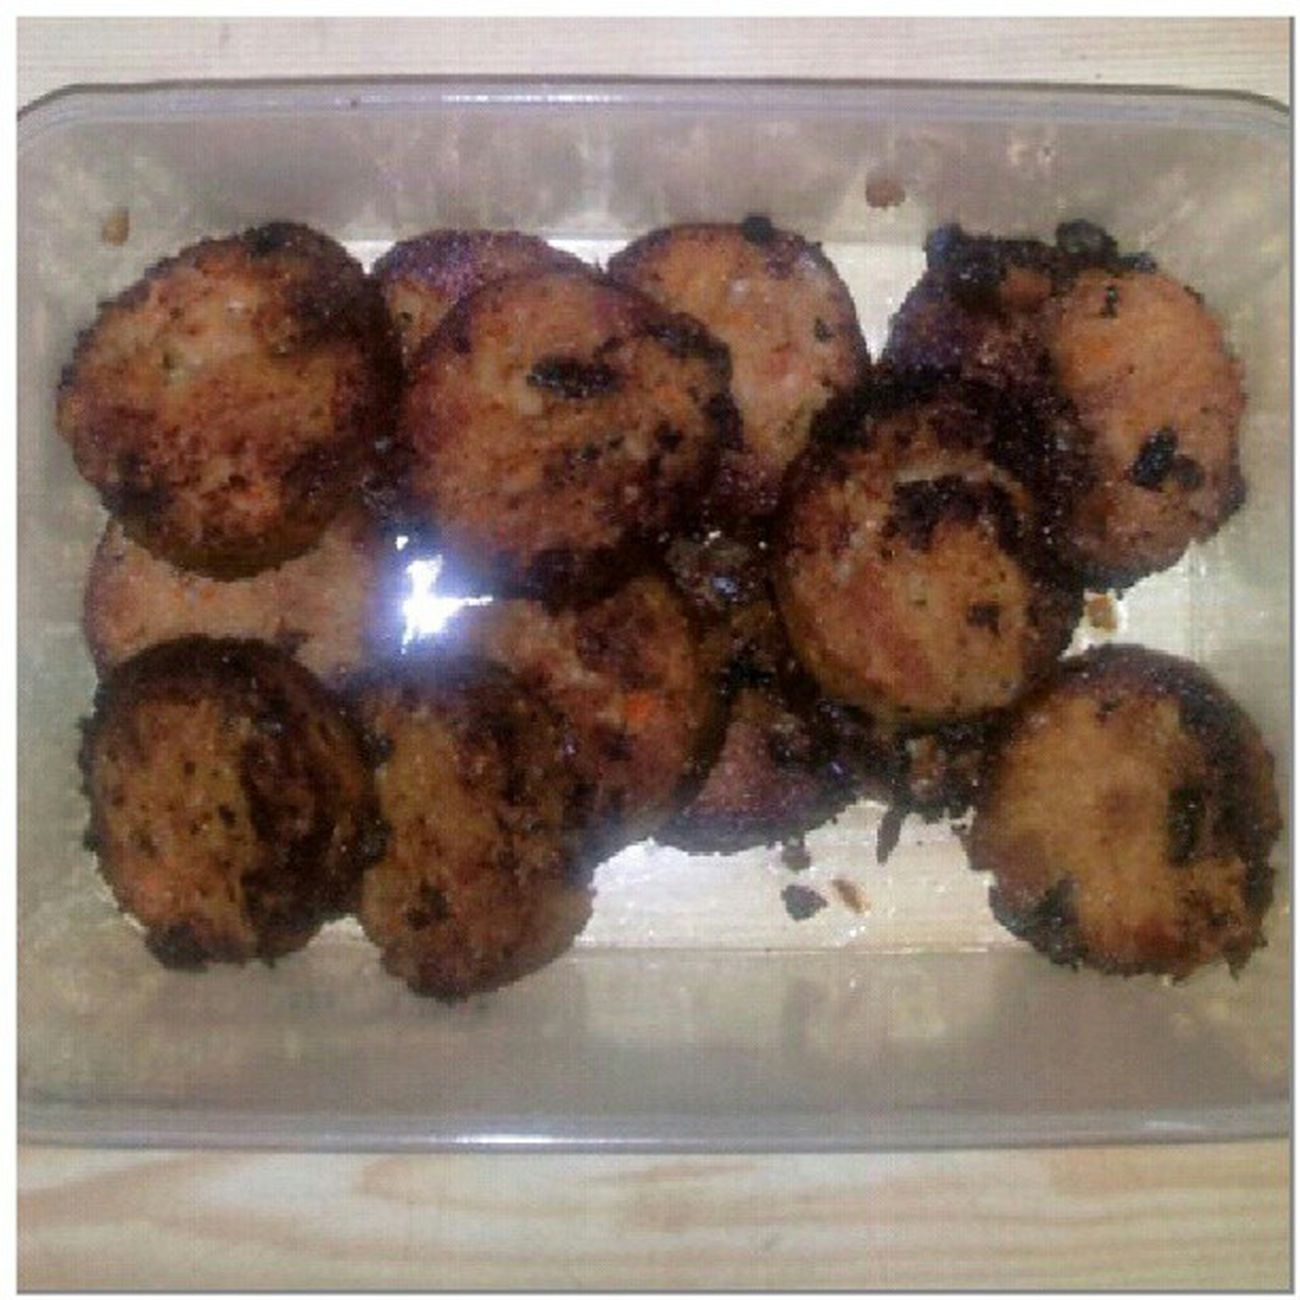 Dinner, fried embutido. Foodie Foodstagram Fooodlover Fooood foodgasm fooodlove foodporn ilovetoeat ilovefood 1stsupperoftheyear